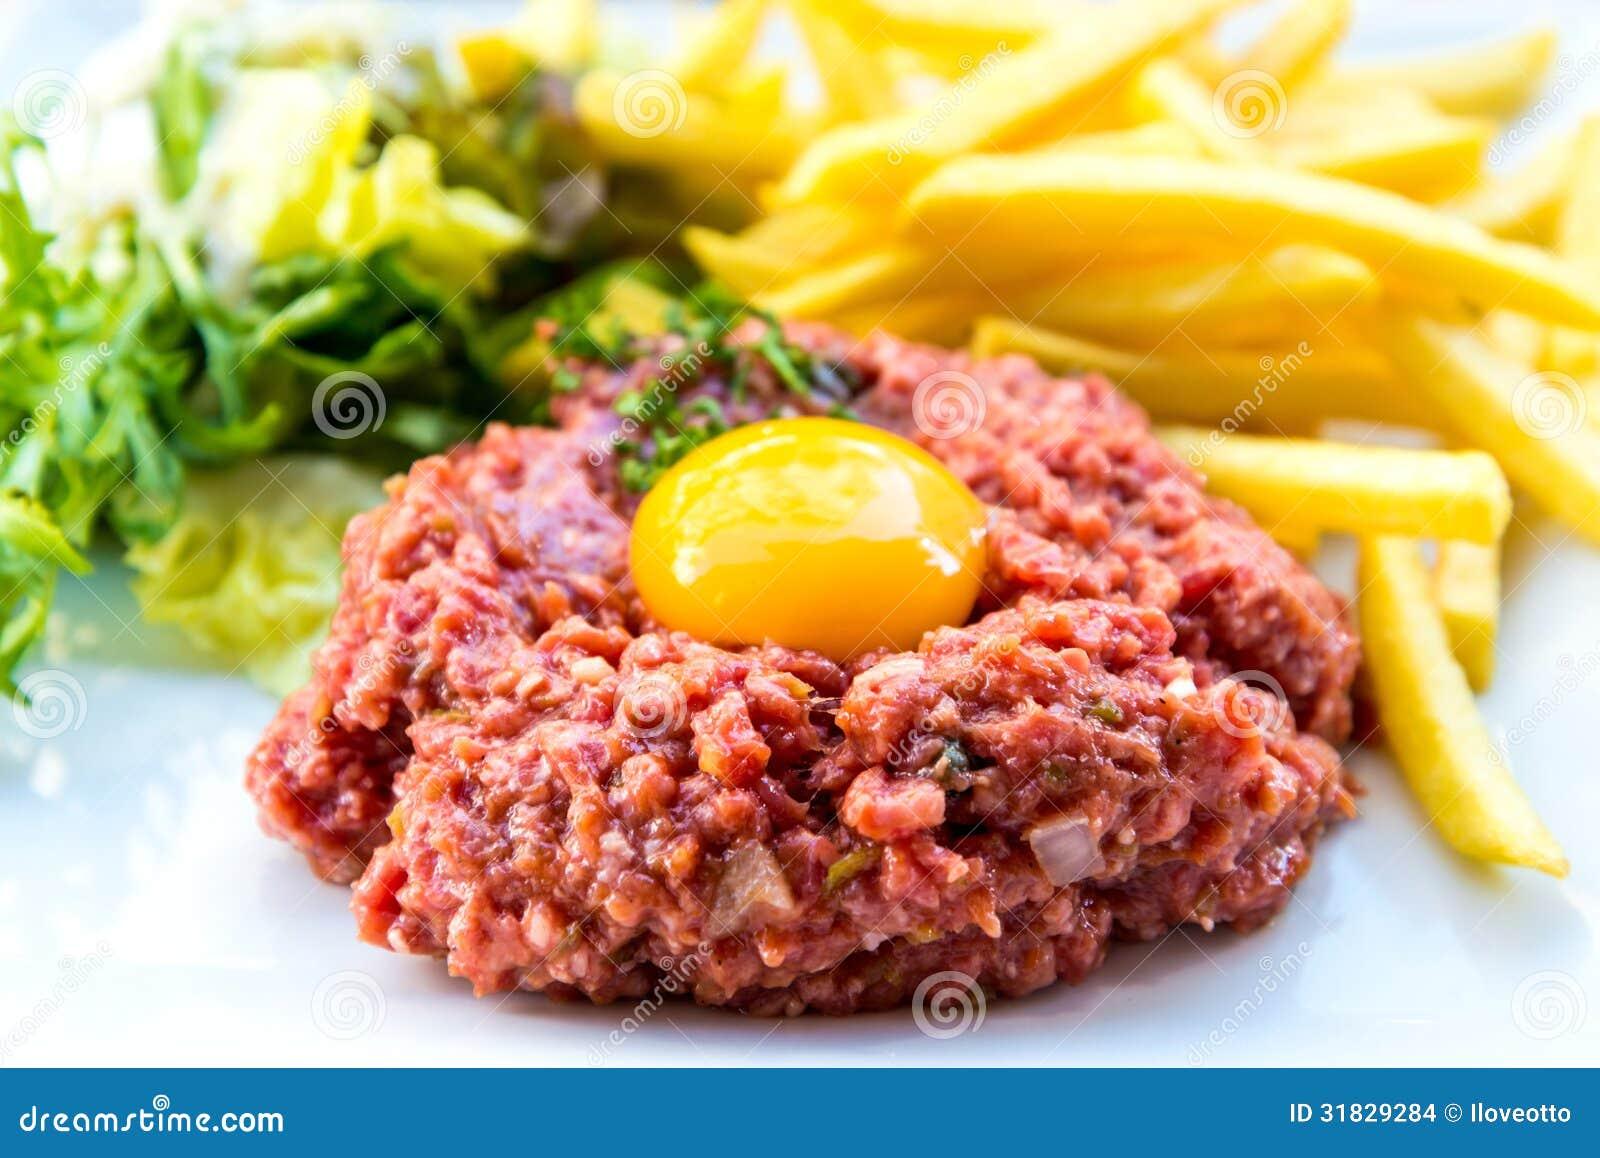 Tasty Steak tartare (Raw beef) - classic steak tartare on white plate.